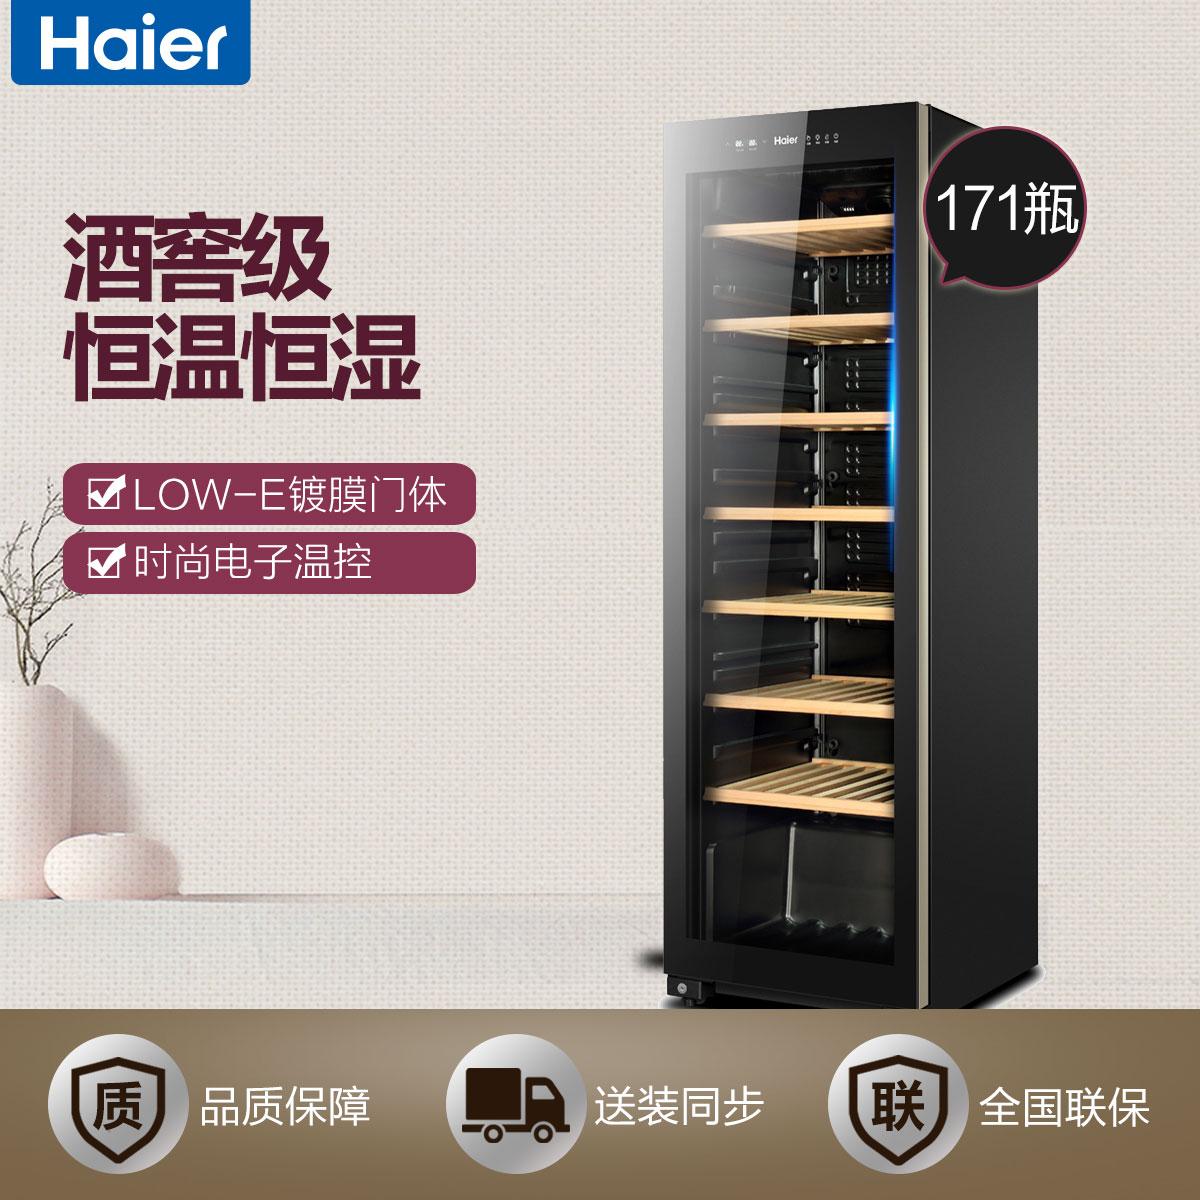 WS171 171瓶装酒窖级恒温恒湿恒温系统LOW-E镀膜门体电子温控 黑色